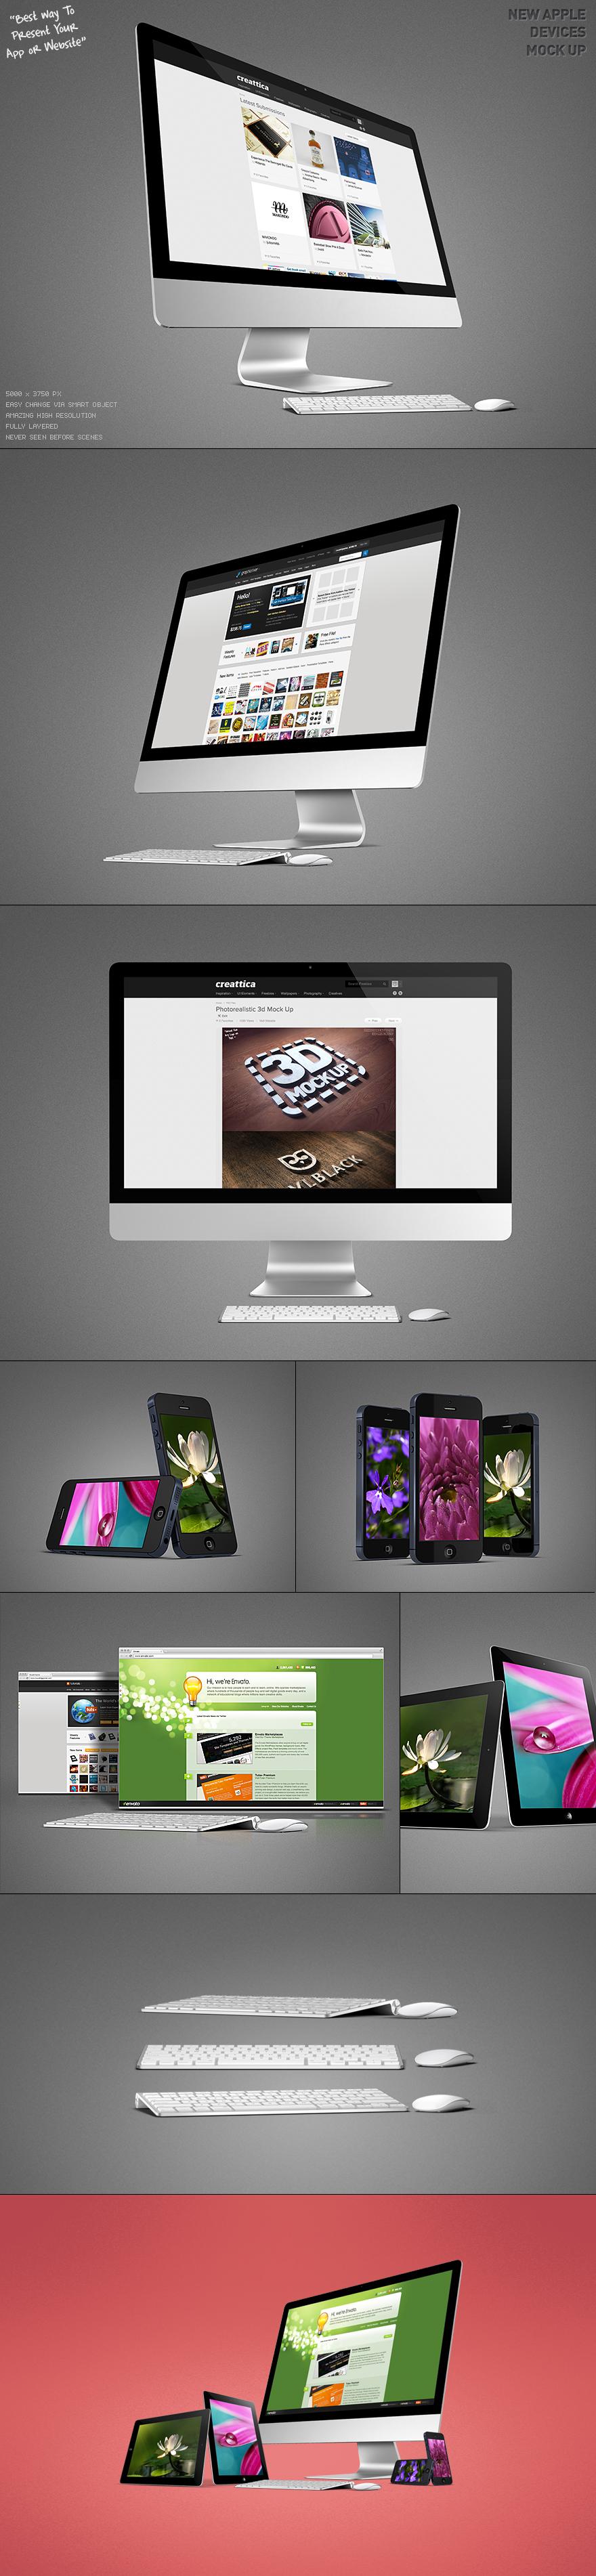 Free New iMac and iPhone5 Mock UP - PSD Files - Creattica | MOCKUPS ...